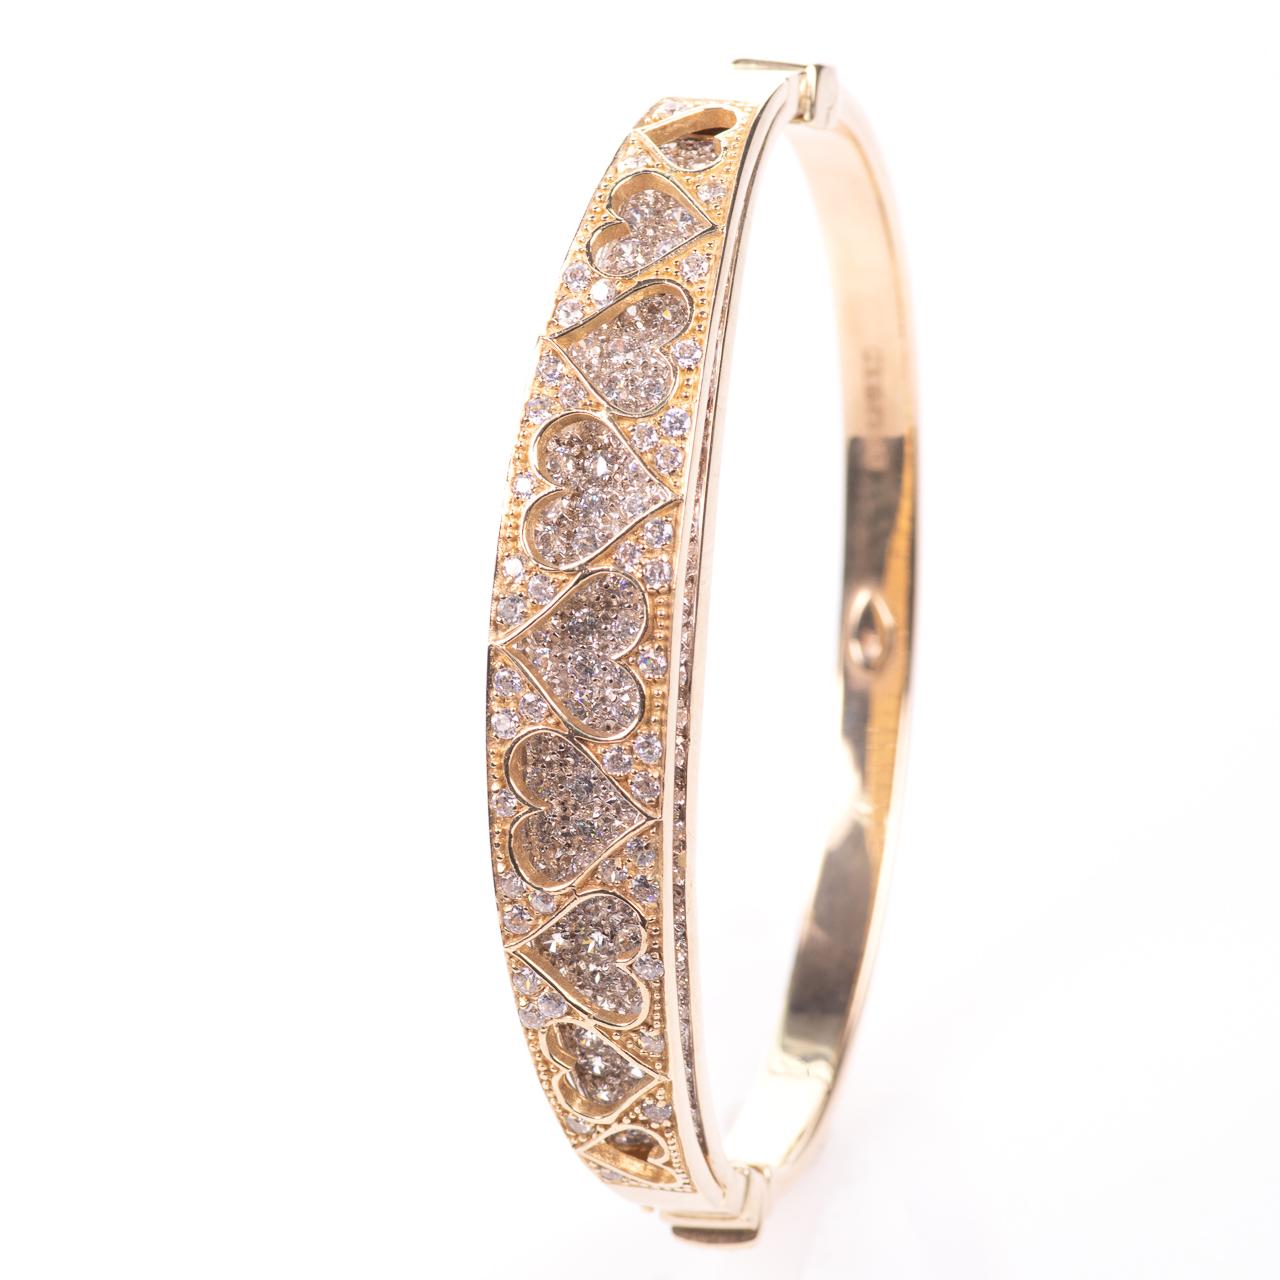 9ct Gold 4ct Diamond Heart Bangle Bracelet